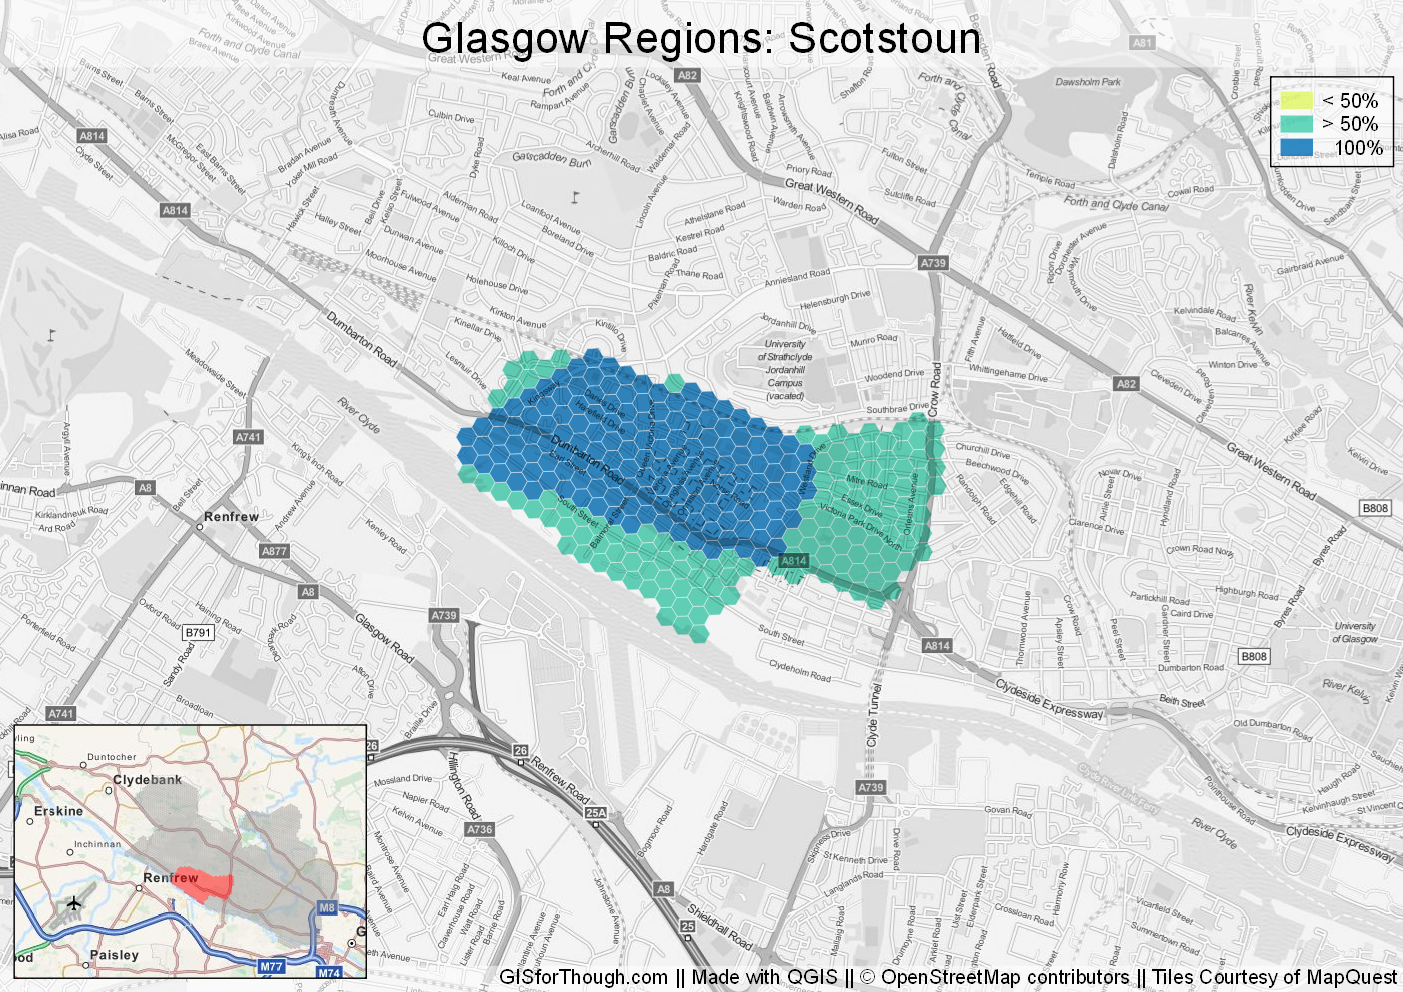 Scotstoun